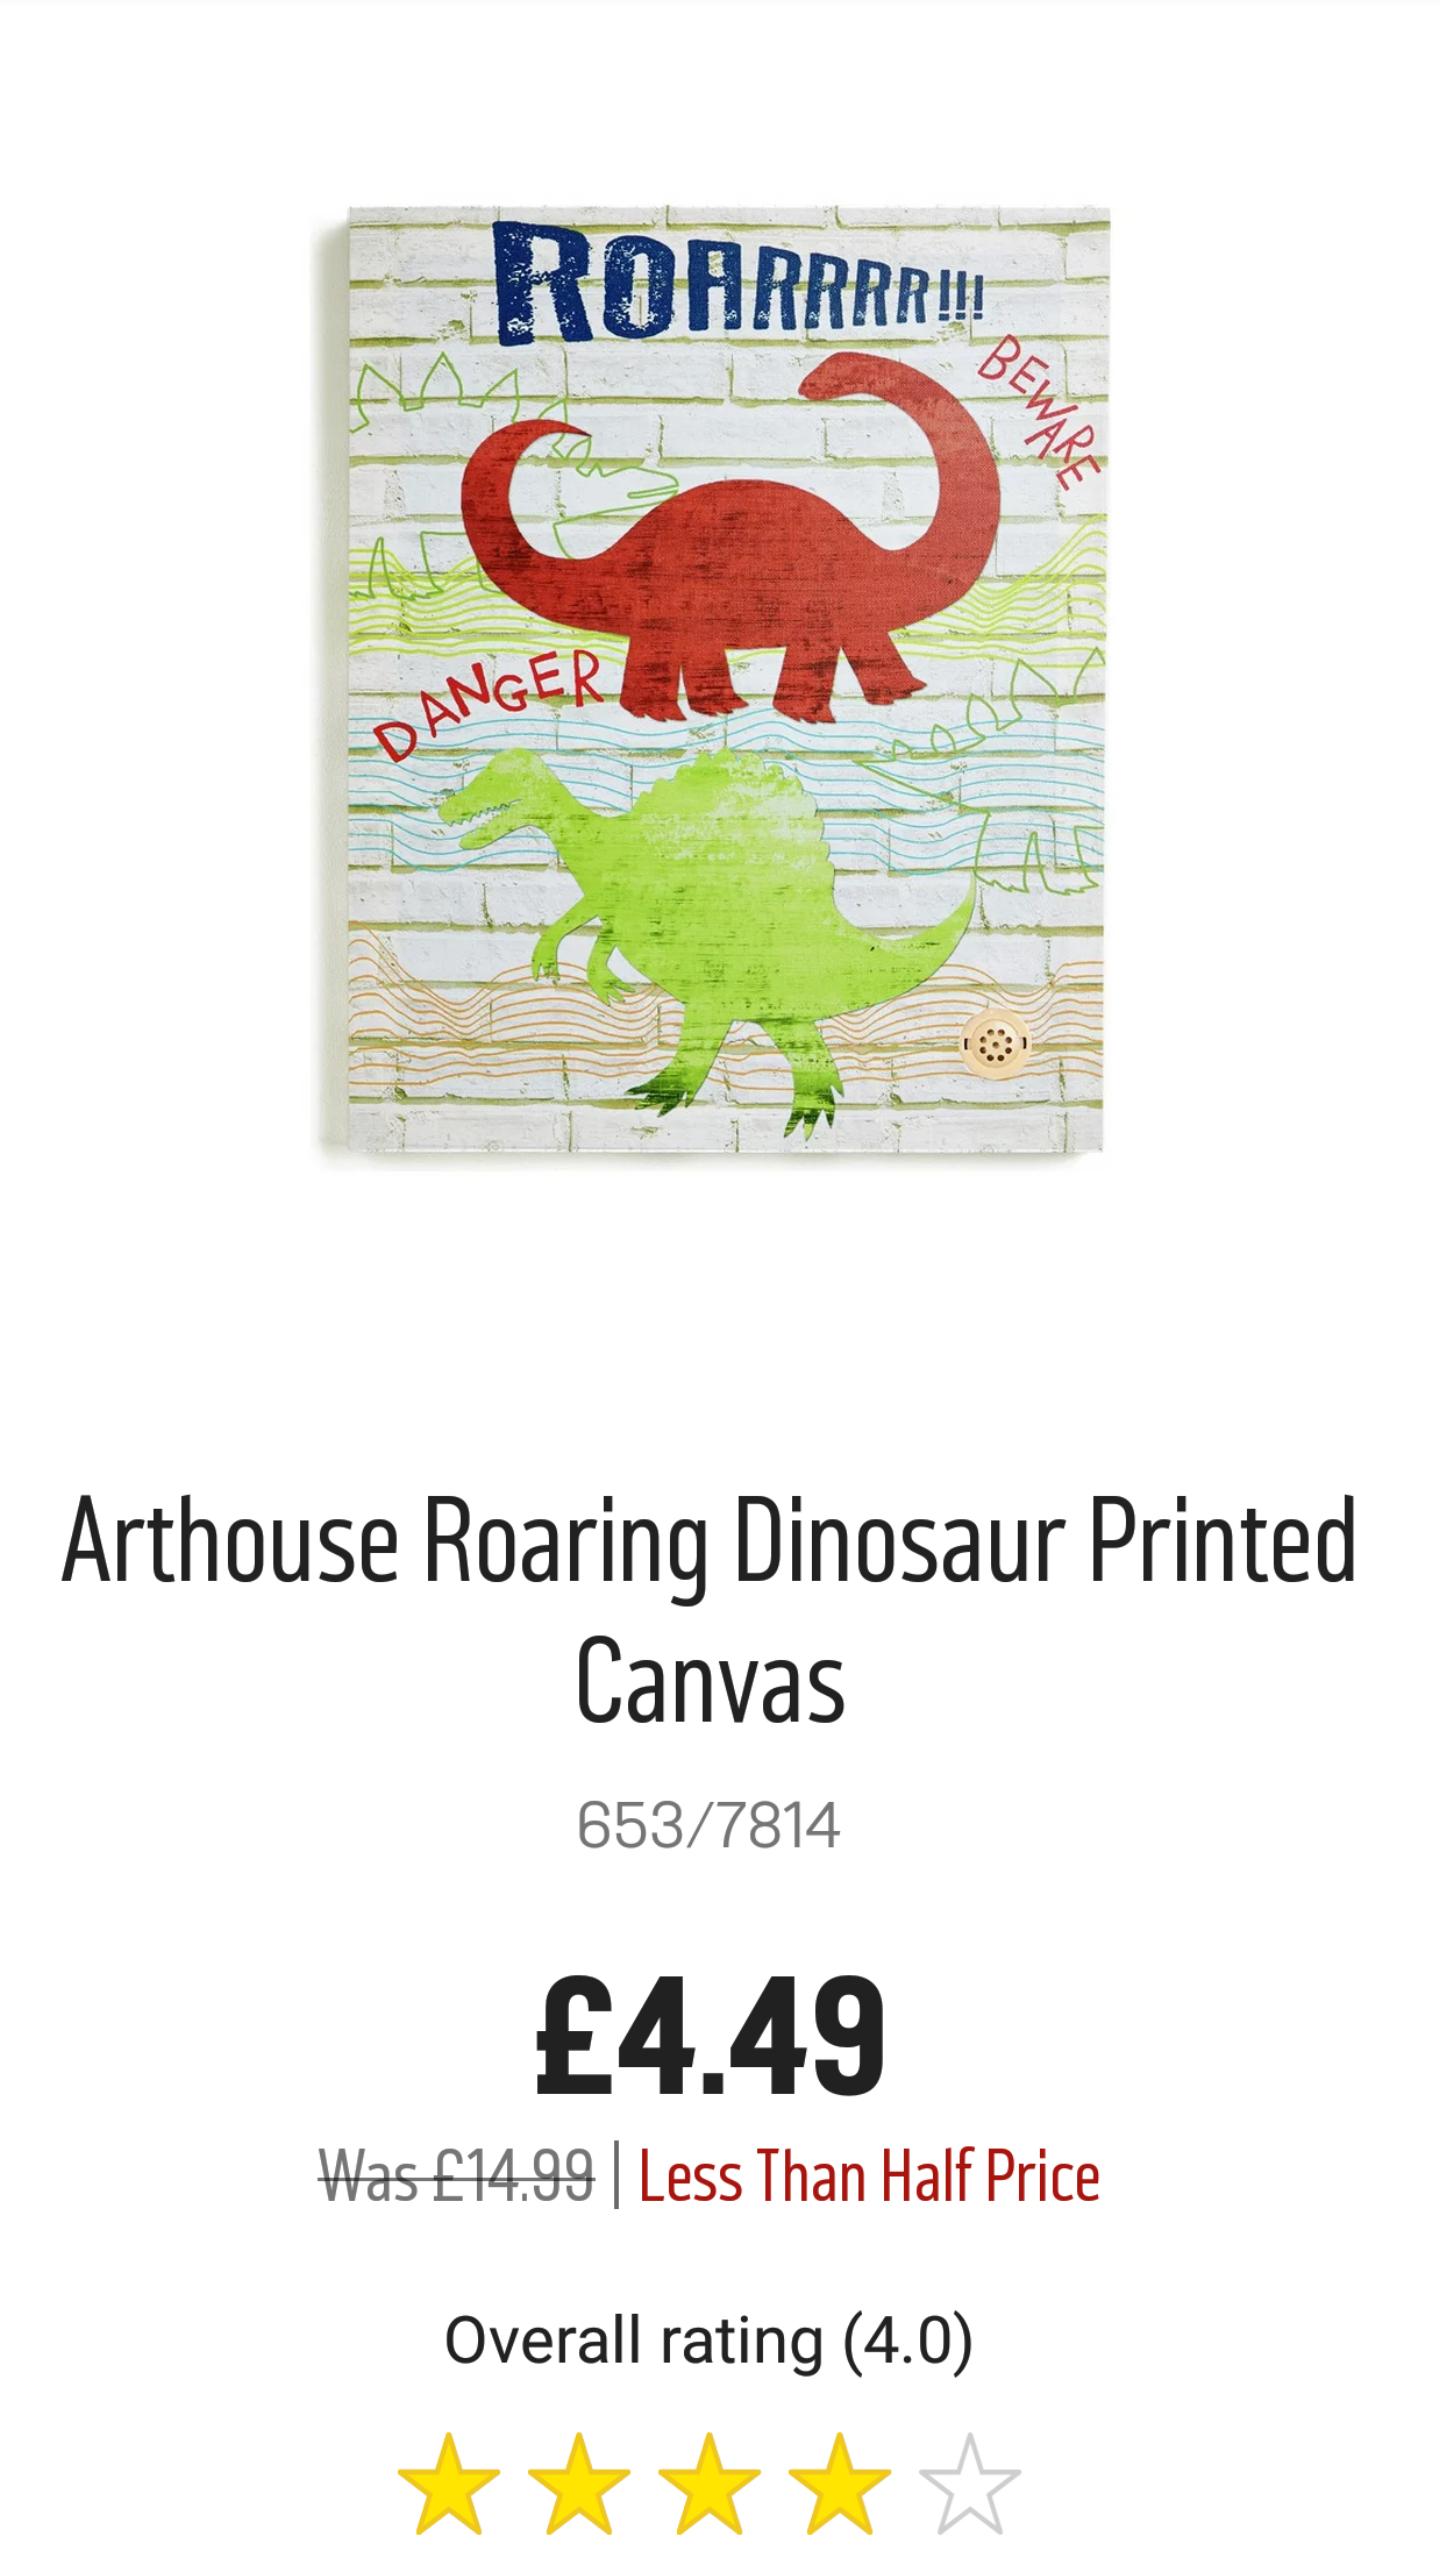 Arthouse Roaring Dinosaur Printed Canvas - Argos - £4.49